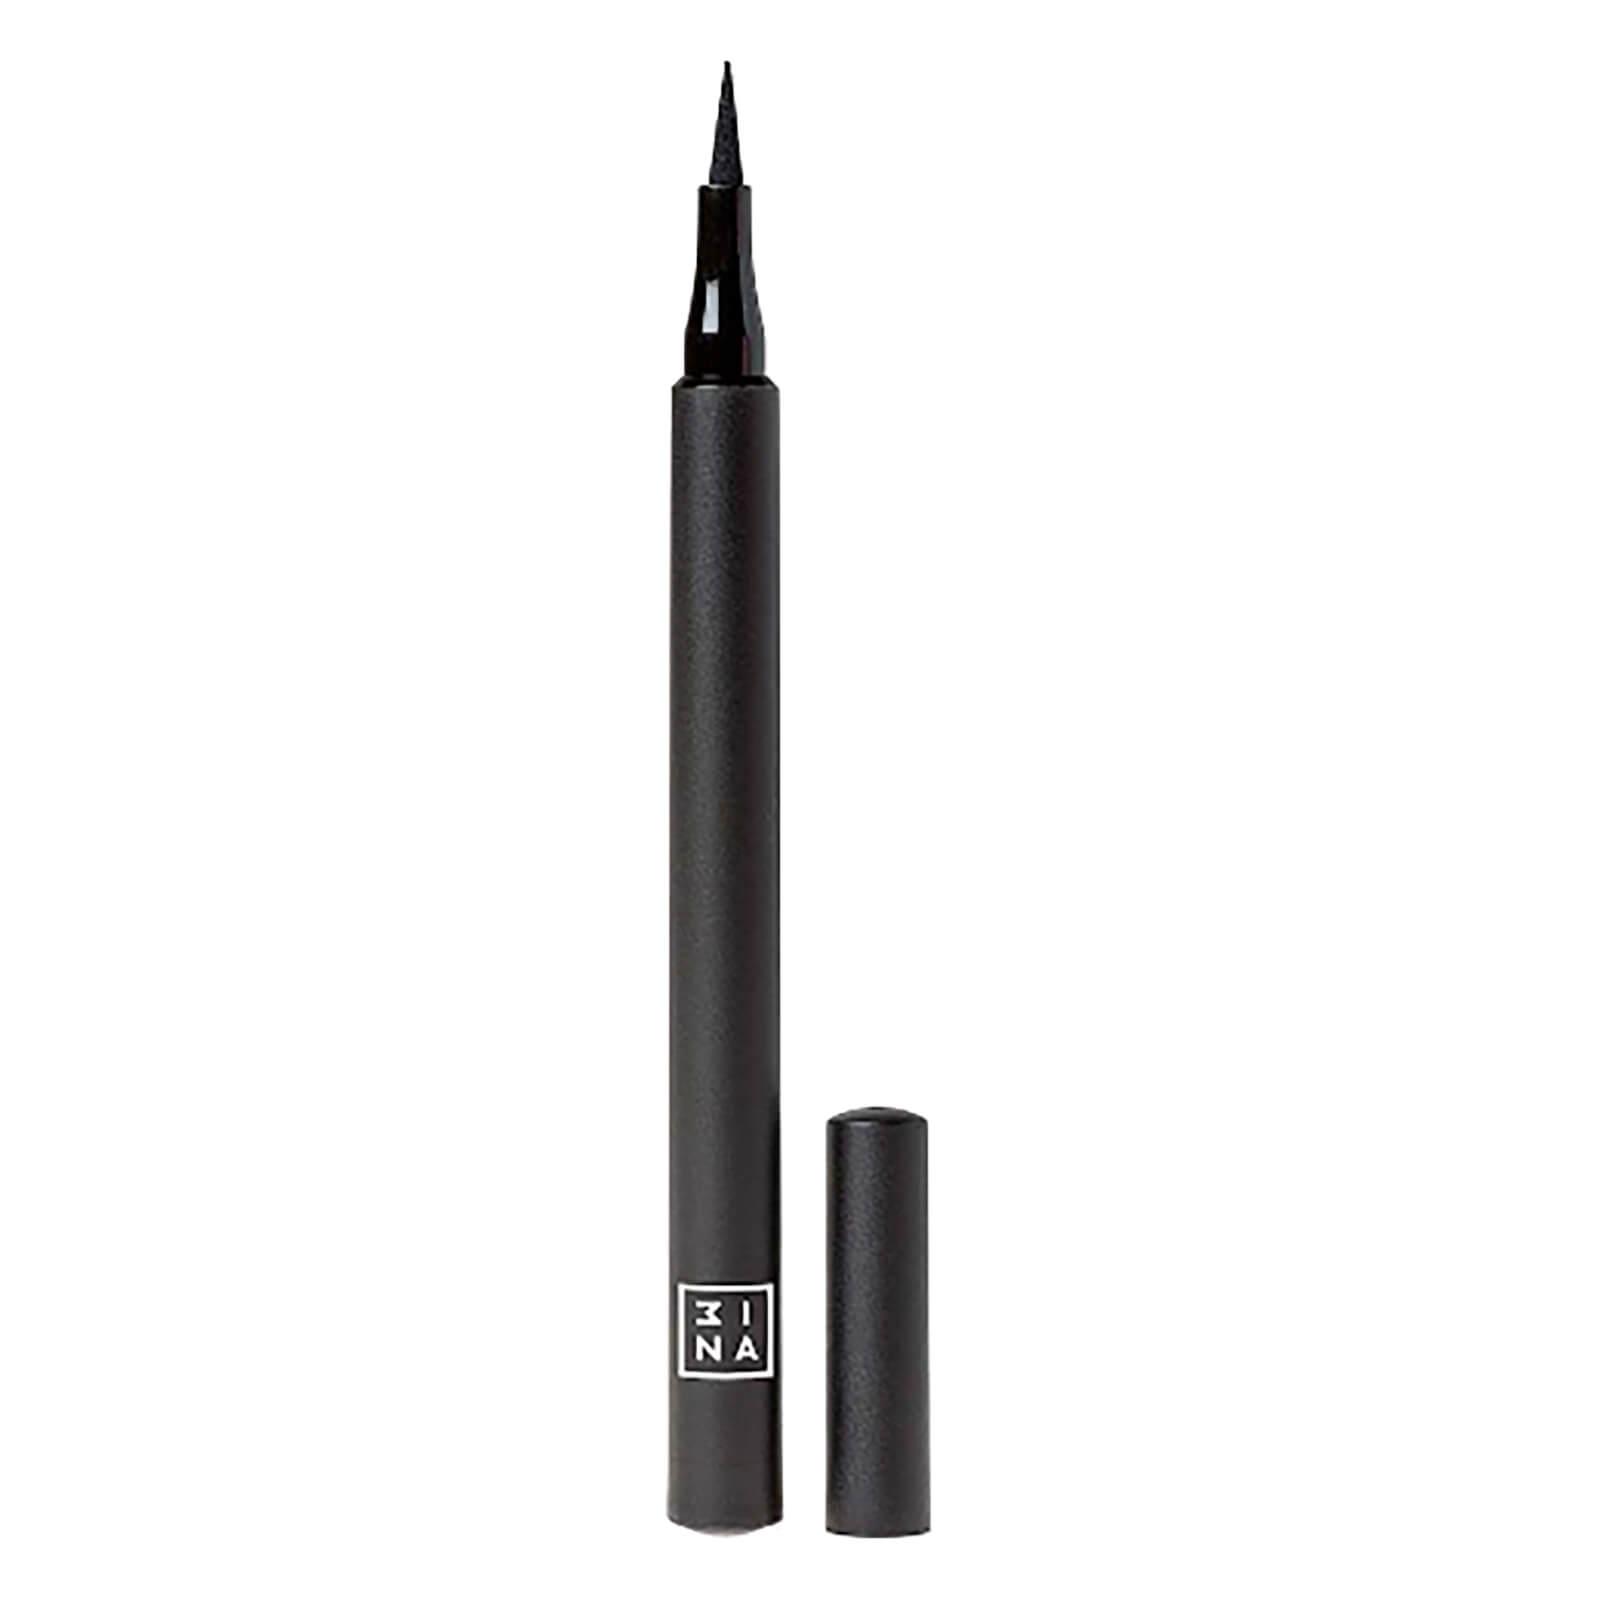 3INA 24H Pen Eye Liner